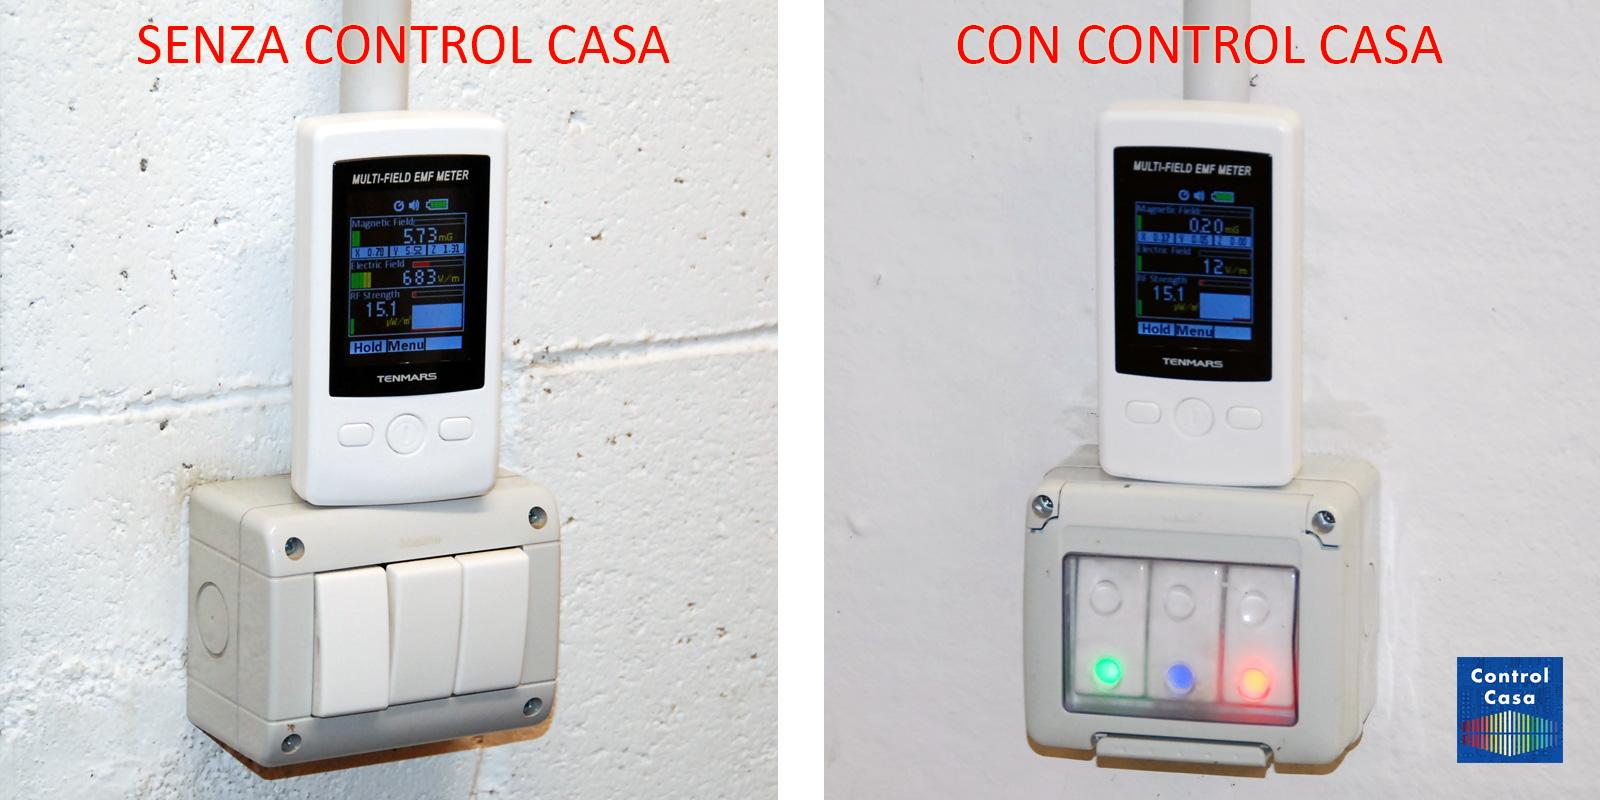 Control Casa, elettrosmog impianto elettrico pulsanti, domotica, impianto domotico, elettrosmog